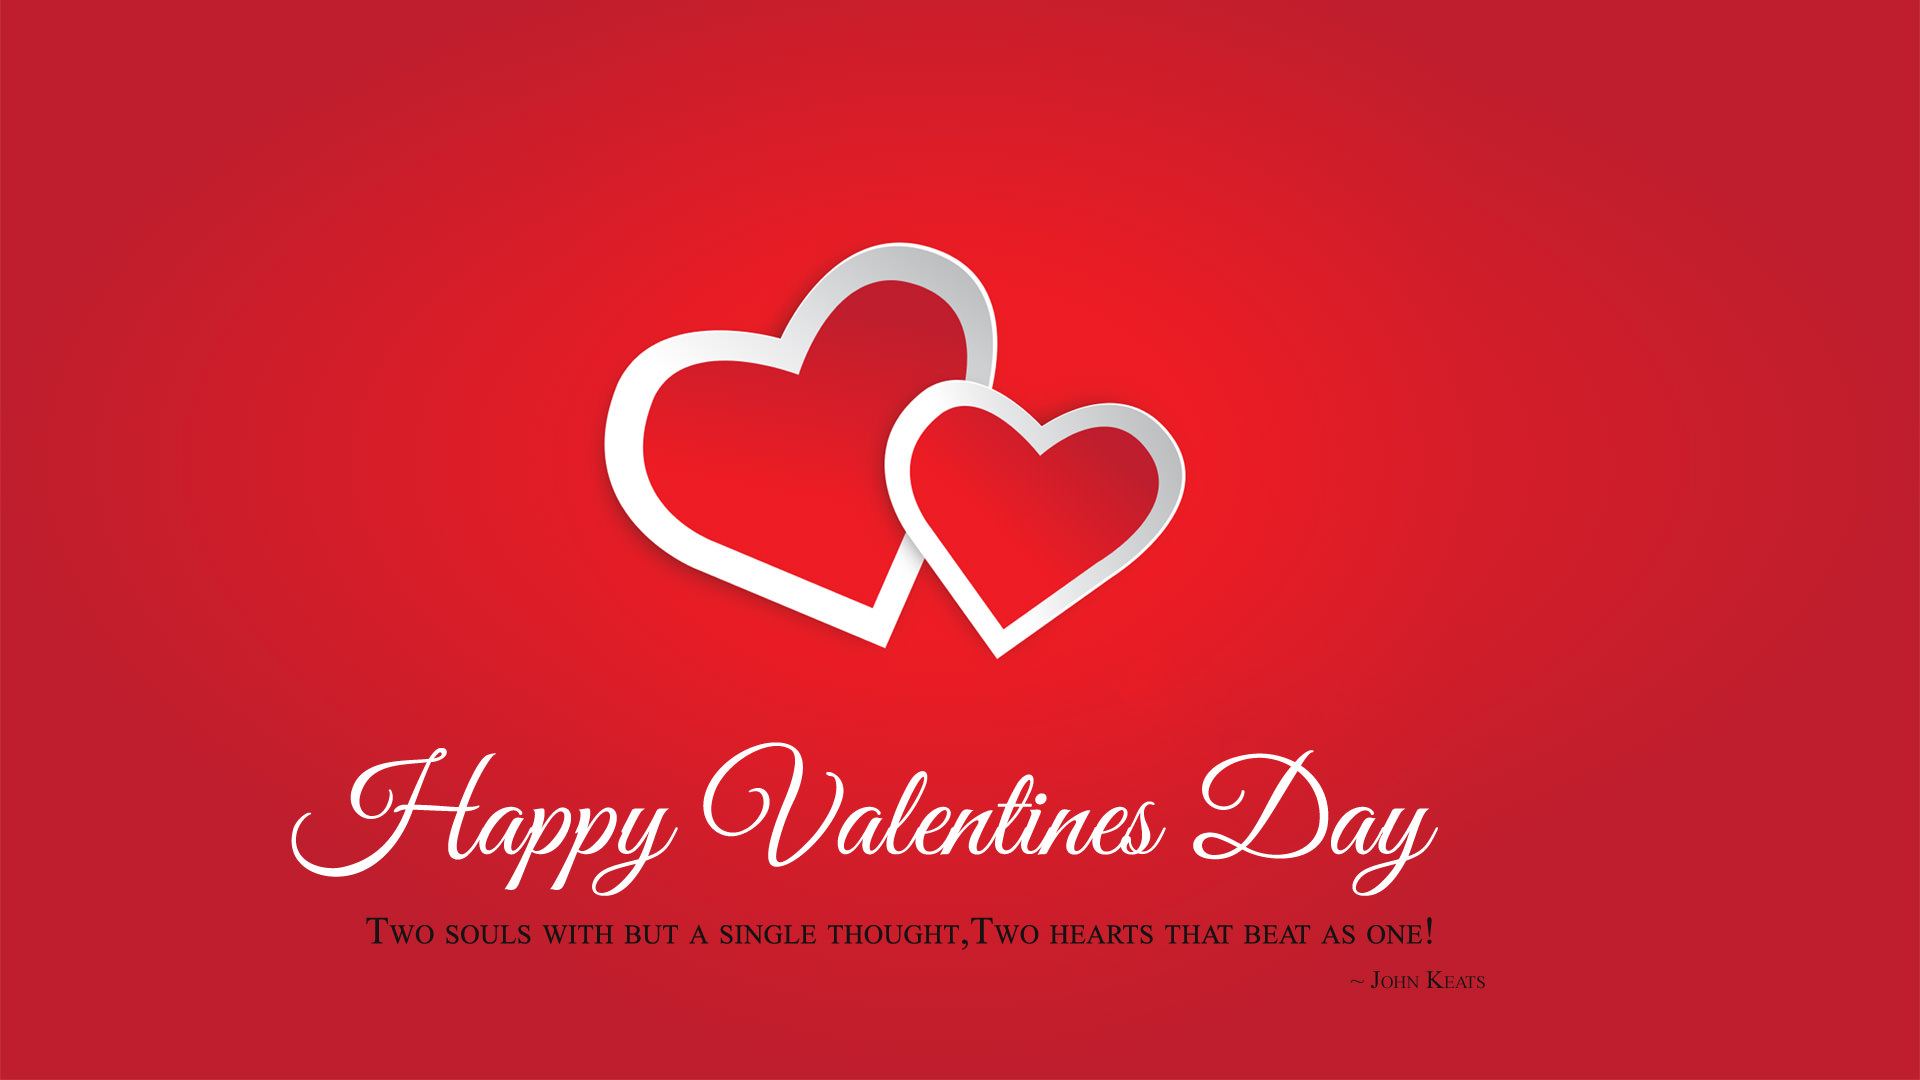 14 Feb Happy Valentines Day Wallpaper, Free Hd Love - Happy Valentine Day 2019 With Name , HD Wallpaper & Backgrounds